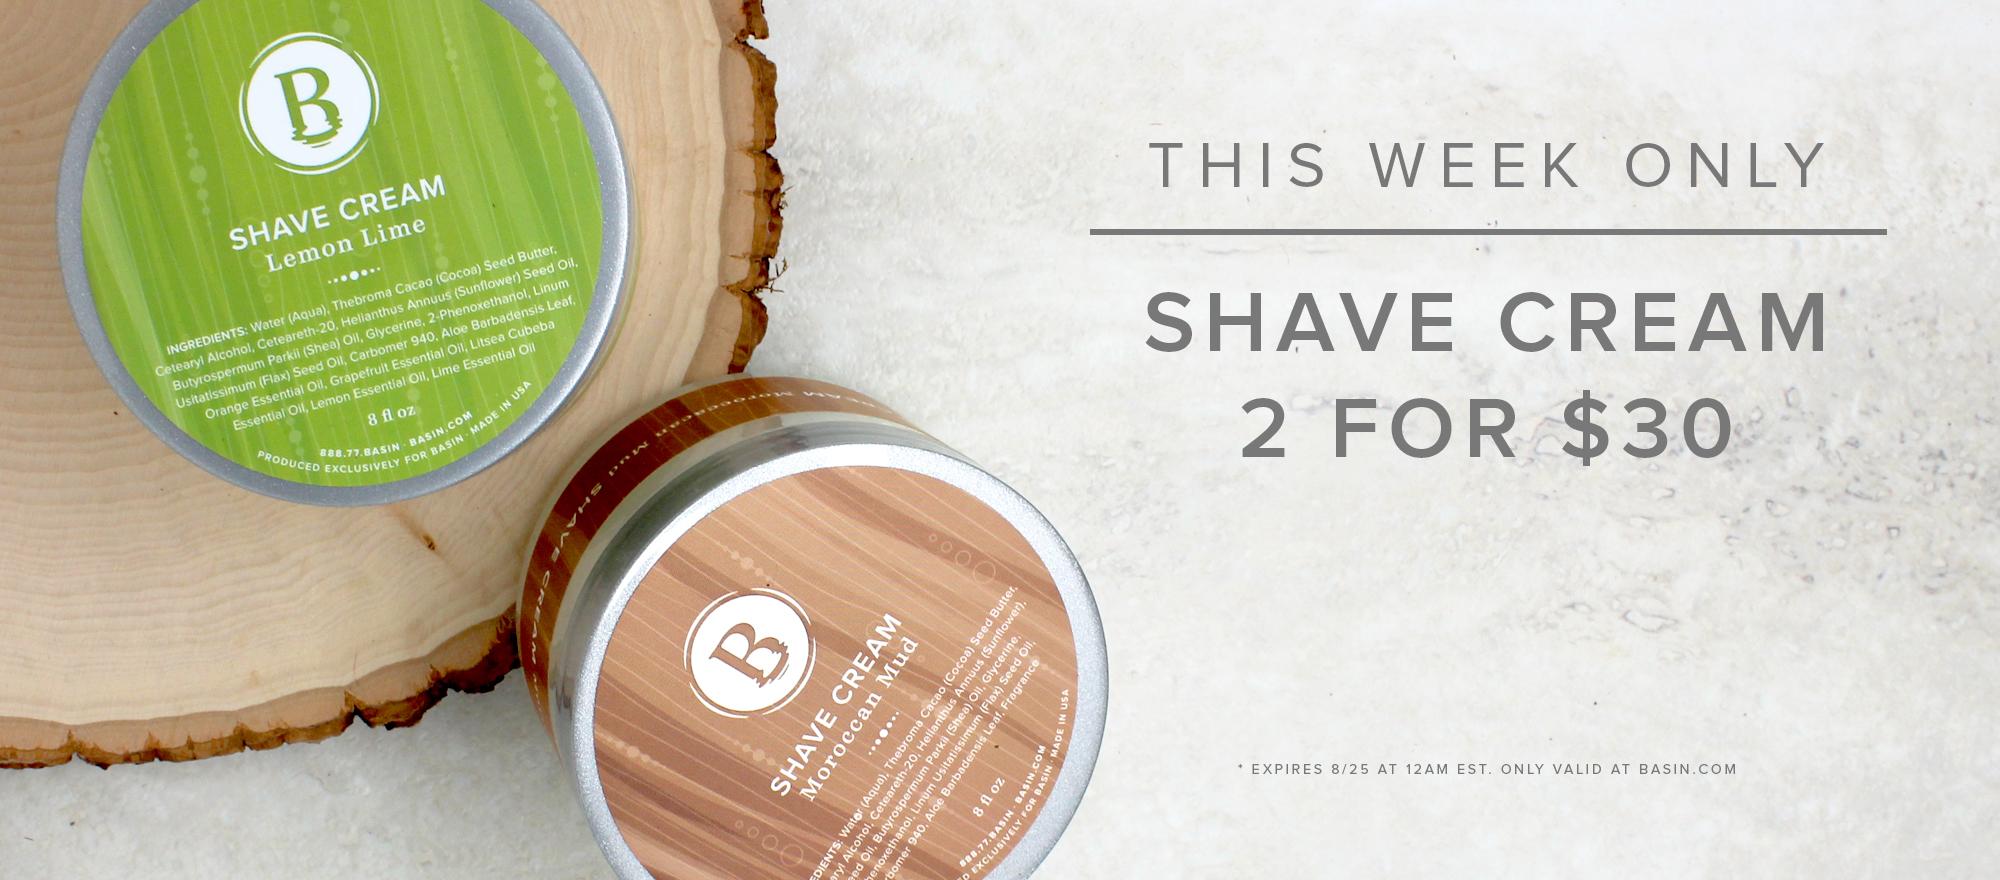 Shave Cream Sale